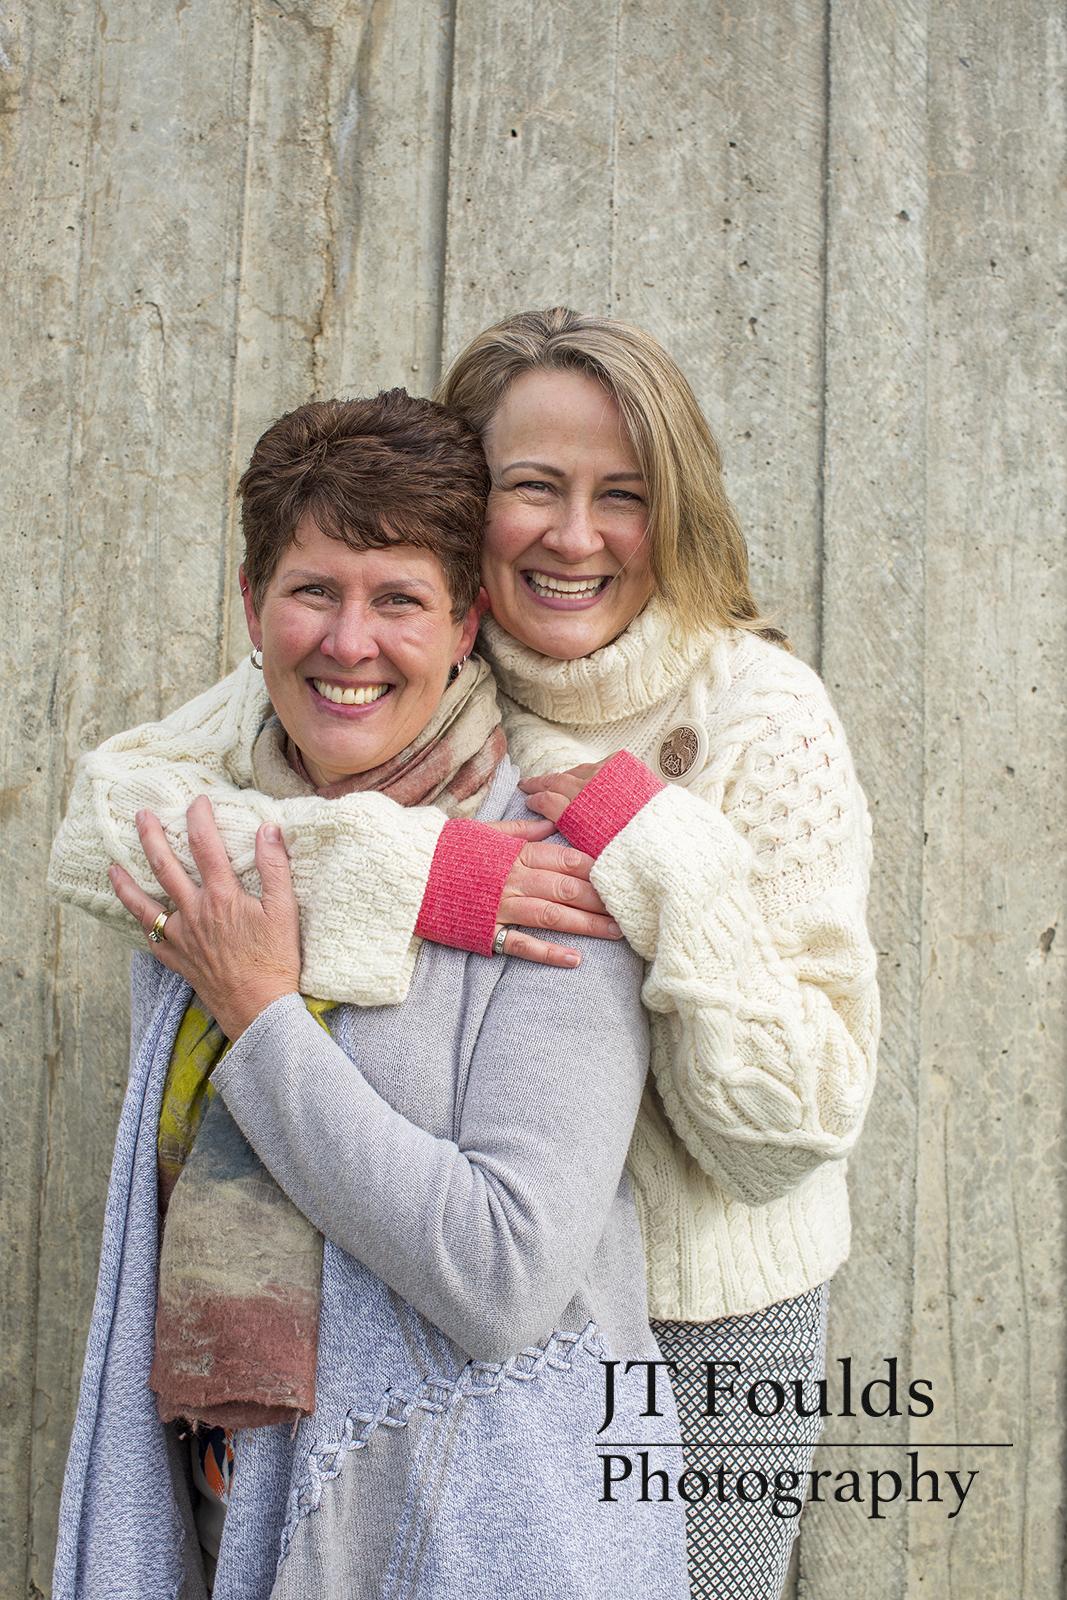 Kate's Surprise Family Shoot - 1 Vimy Pl - 28 Apr 19 - 055.jpg